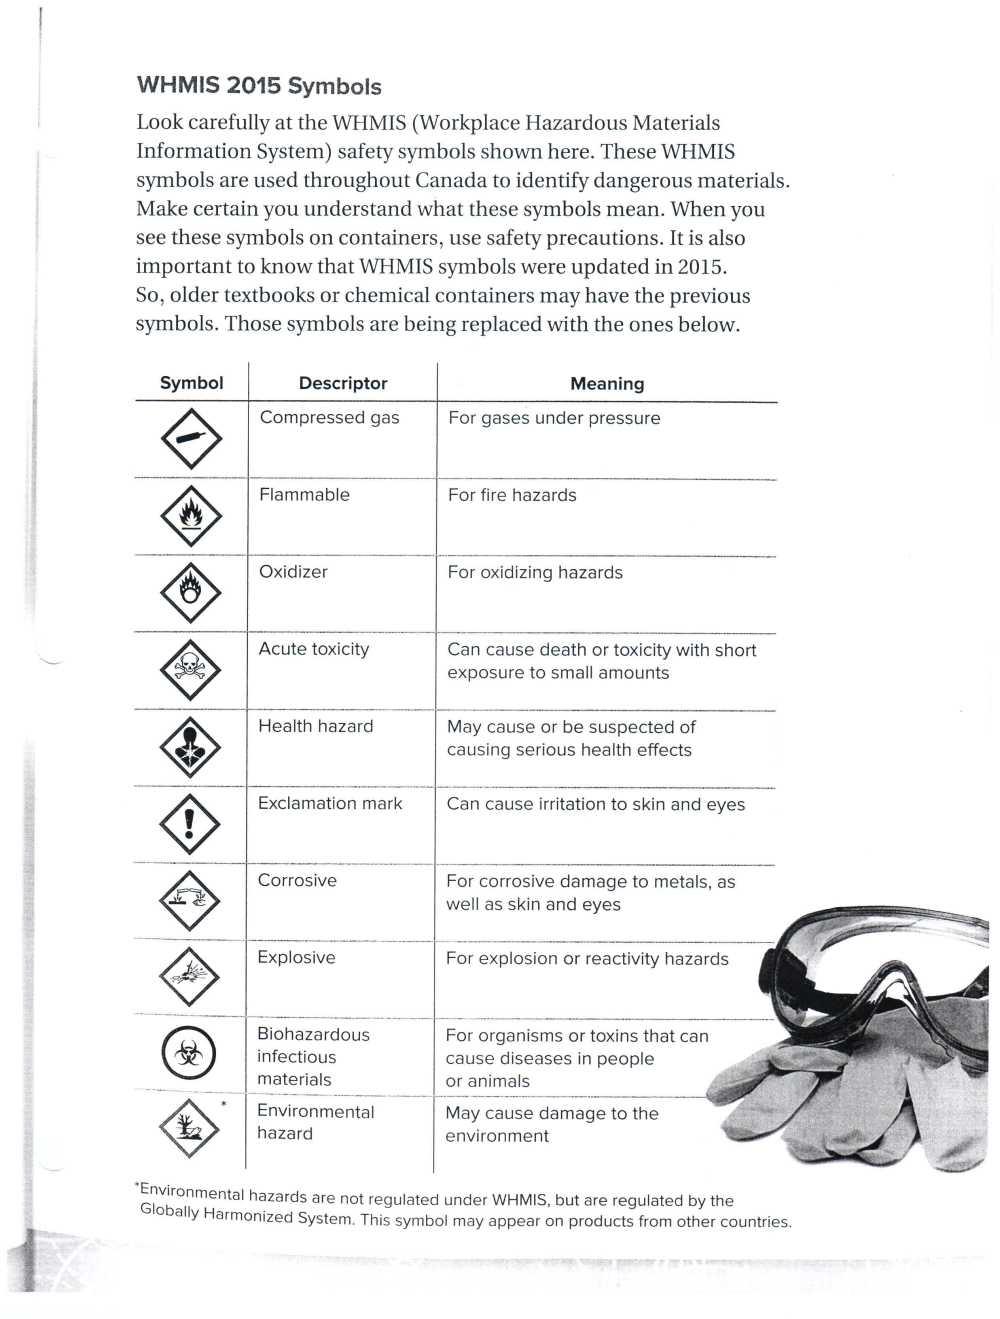 medium resolution of Lab Safety Symbols Worksheet - Nidecmege